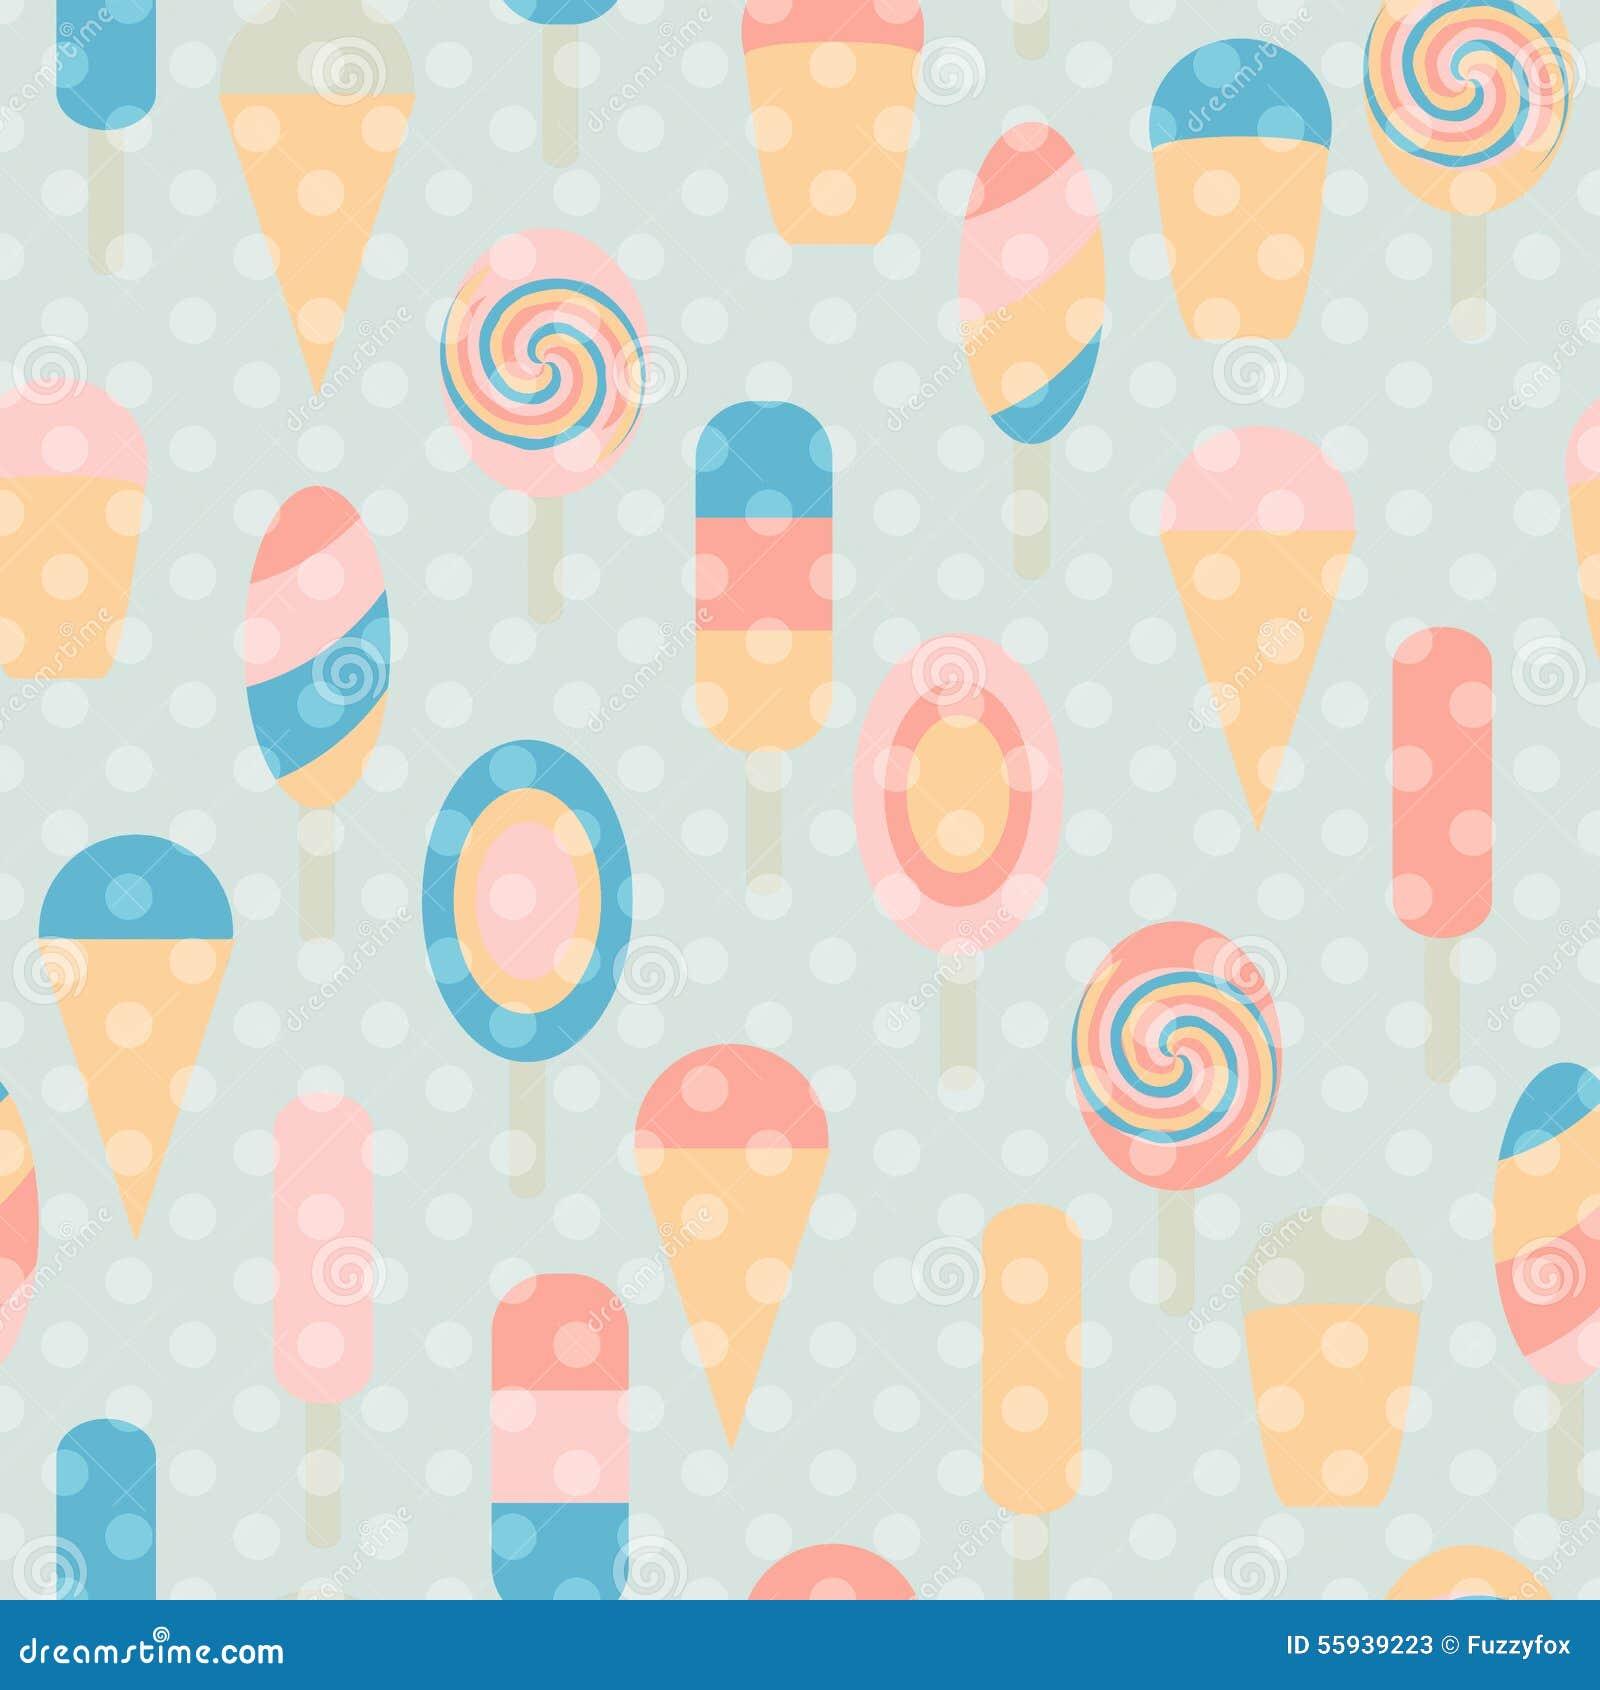 Seamless Ice Cream Background Vintage Style: Ice Cream Seamless Vintage Pattern